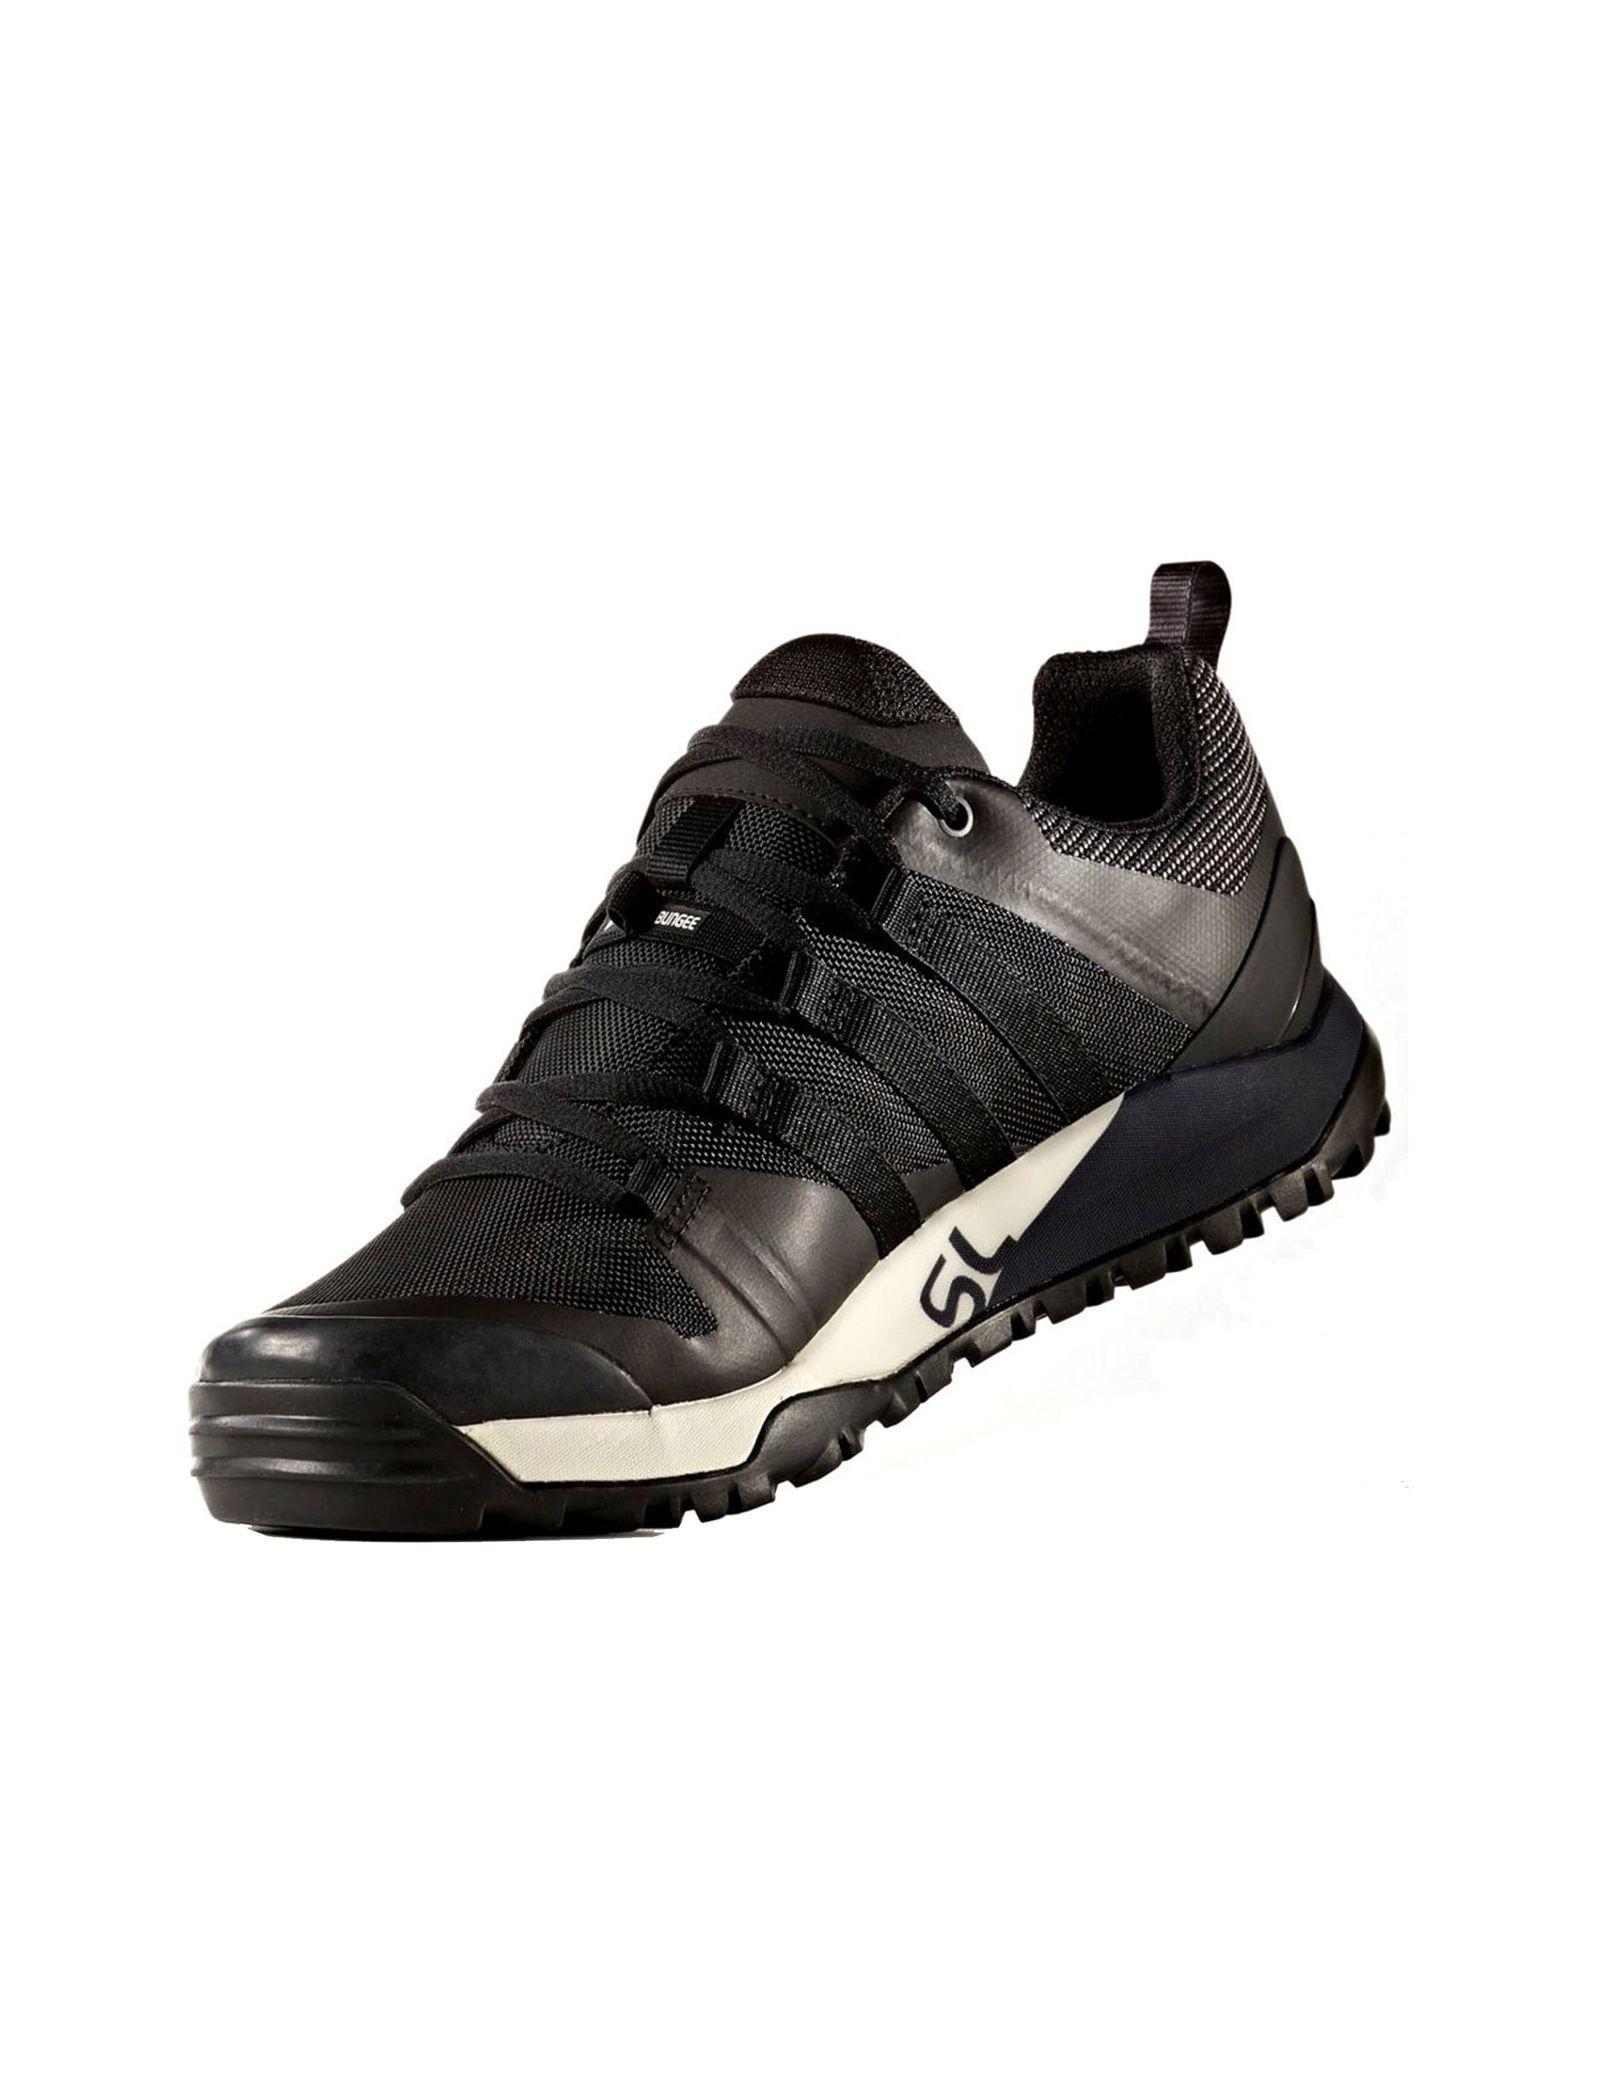 کفش طبیعت گردی بندی مردانه Terrex Trail Cross SL - آدیداس - مشکي - 4